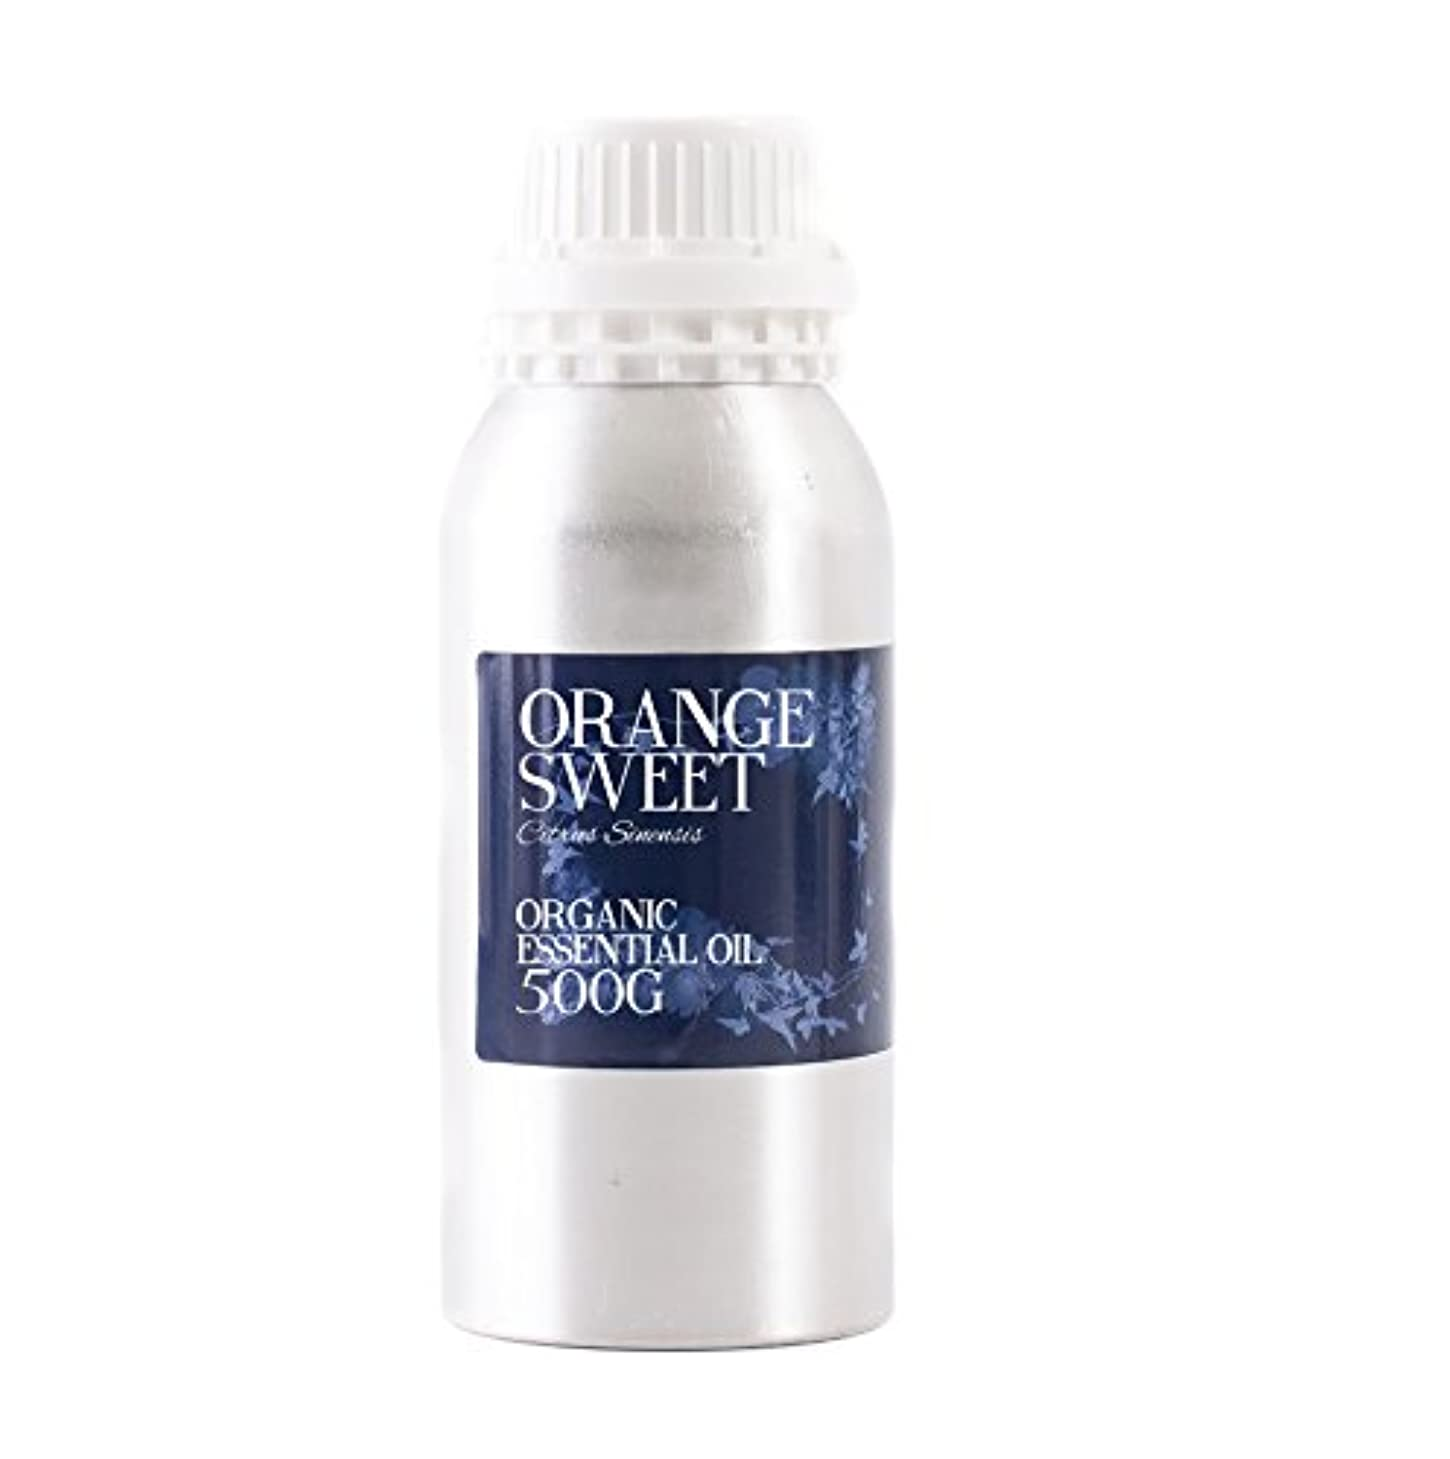 Mystic Moments | Orange Sweet Organic Essential Oil - 500g - 100% Pure